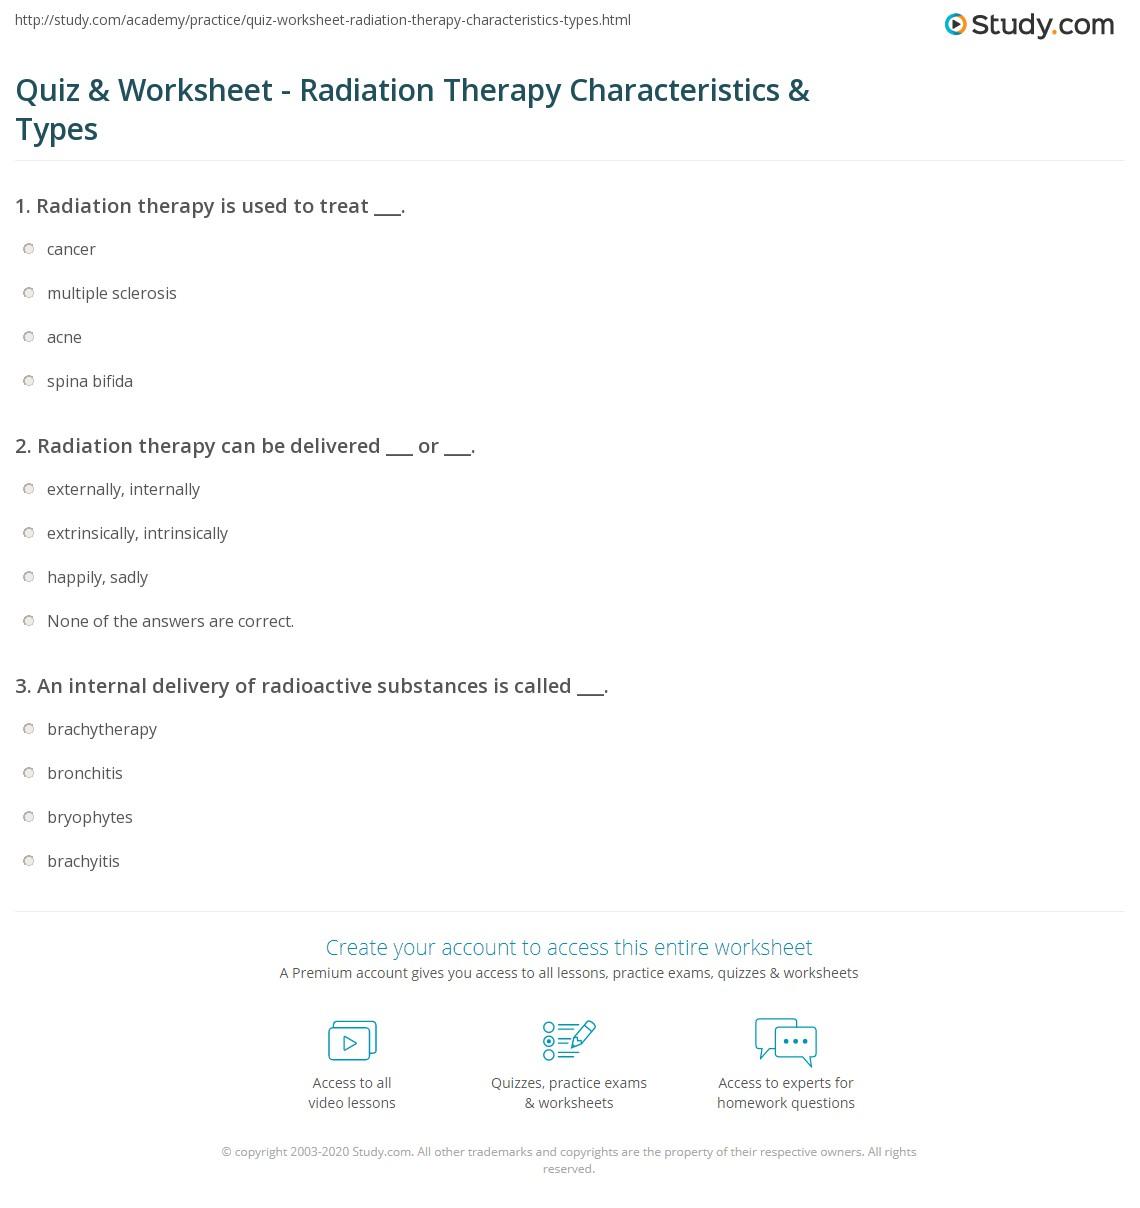 quiz & worksheet - radiation therapy characteristics & types | study